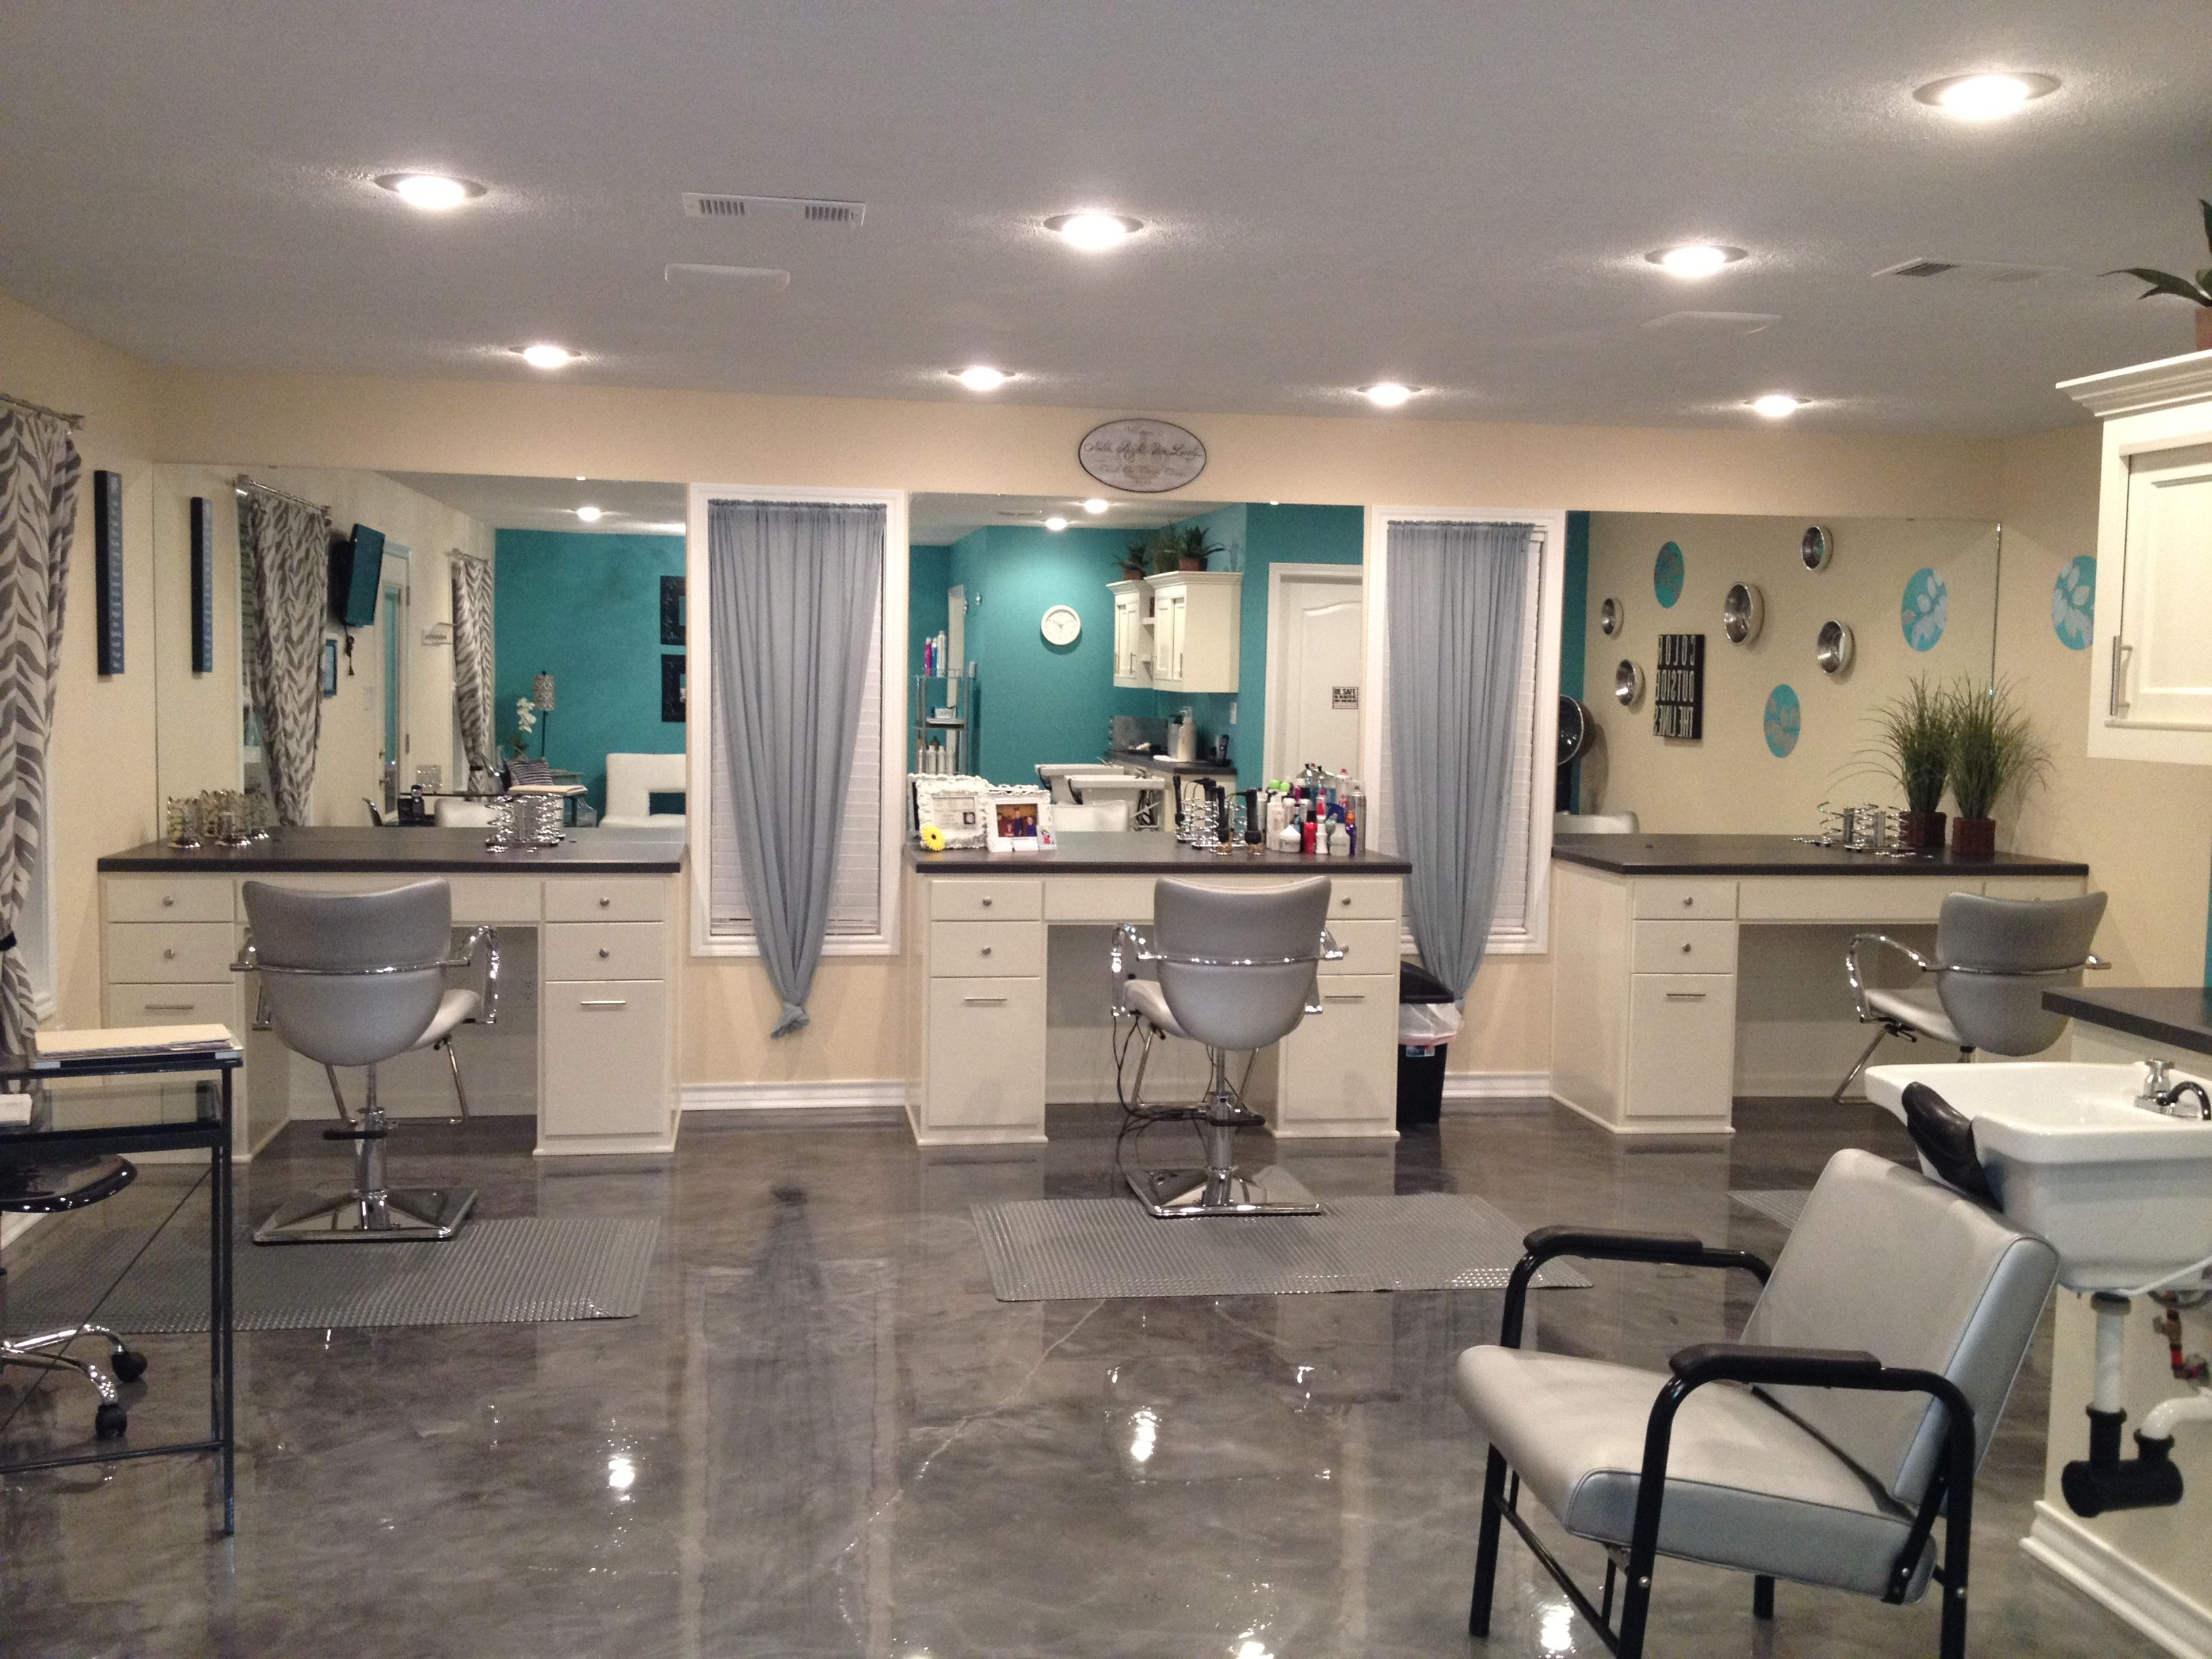 Best 25+ Small beauty salon ideas ideas on Pinterest | Small salon, Beauty  salon reception ideas and Small hair salon